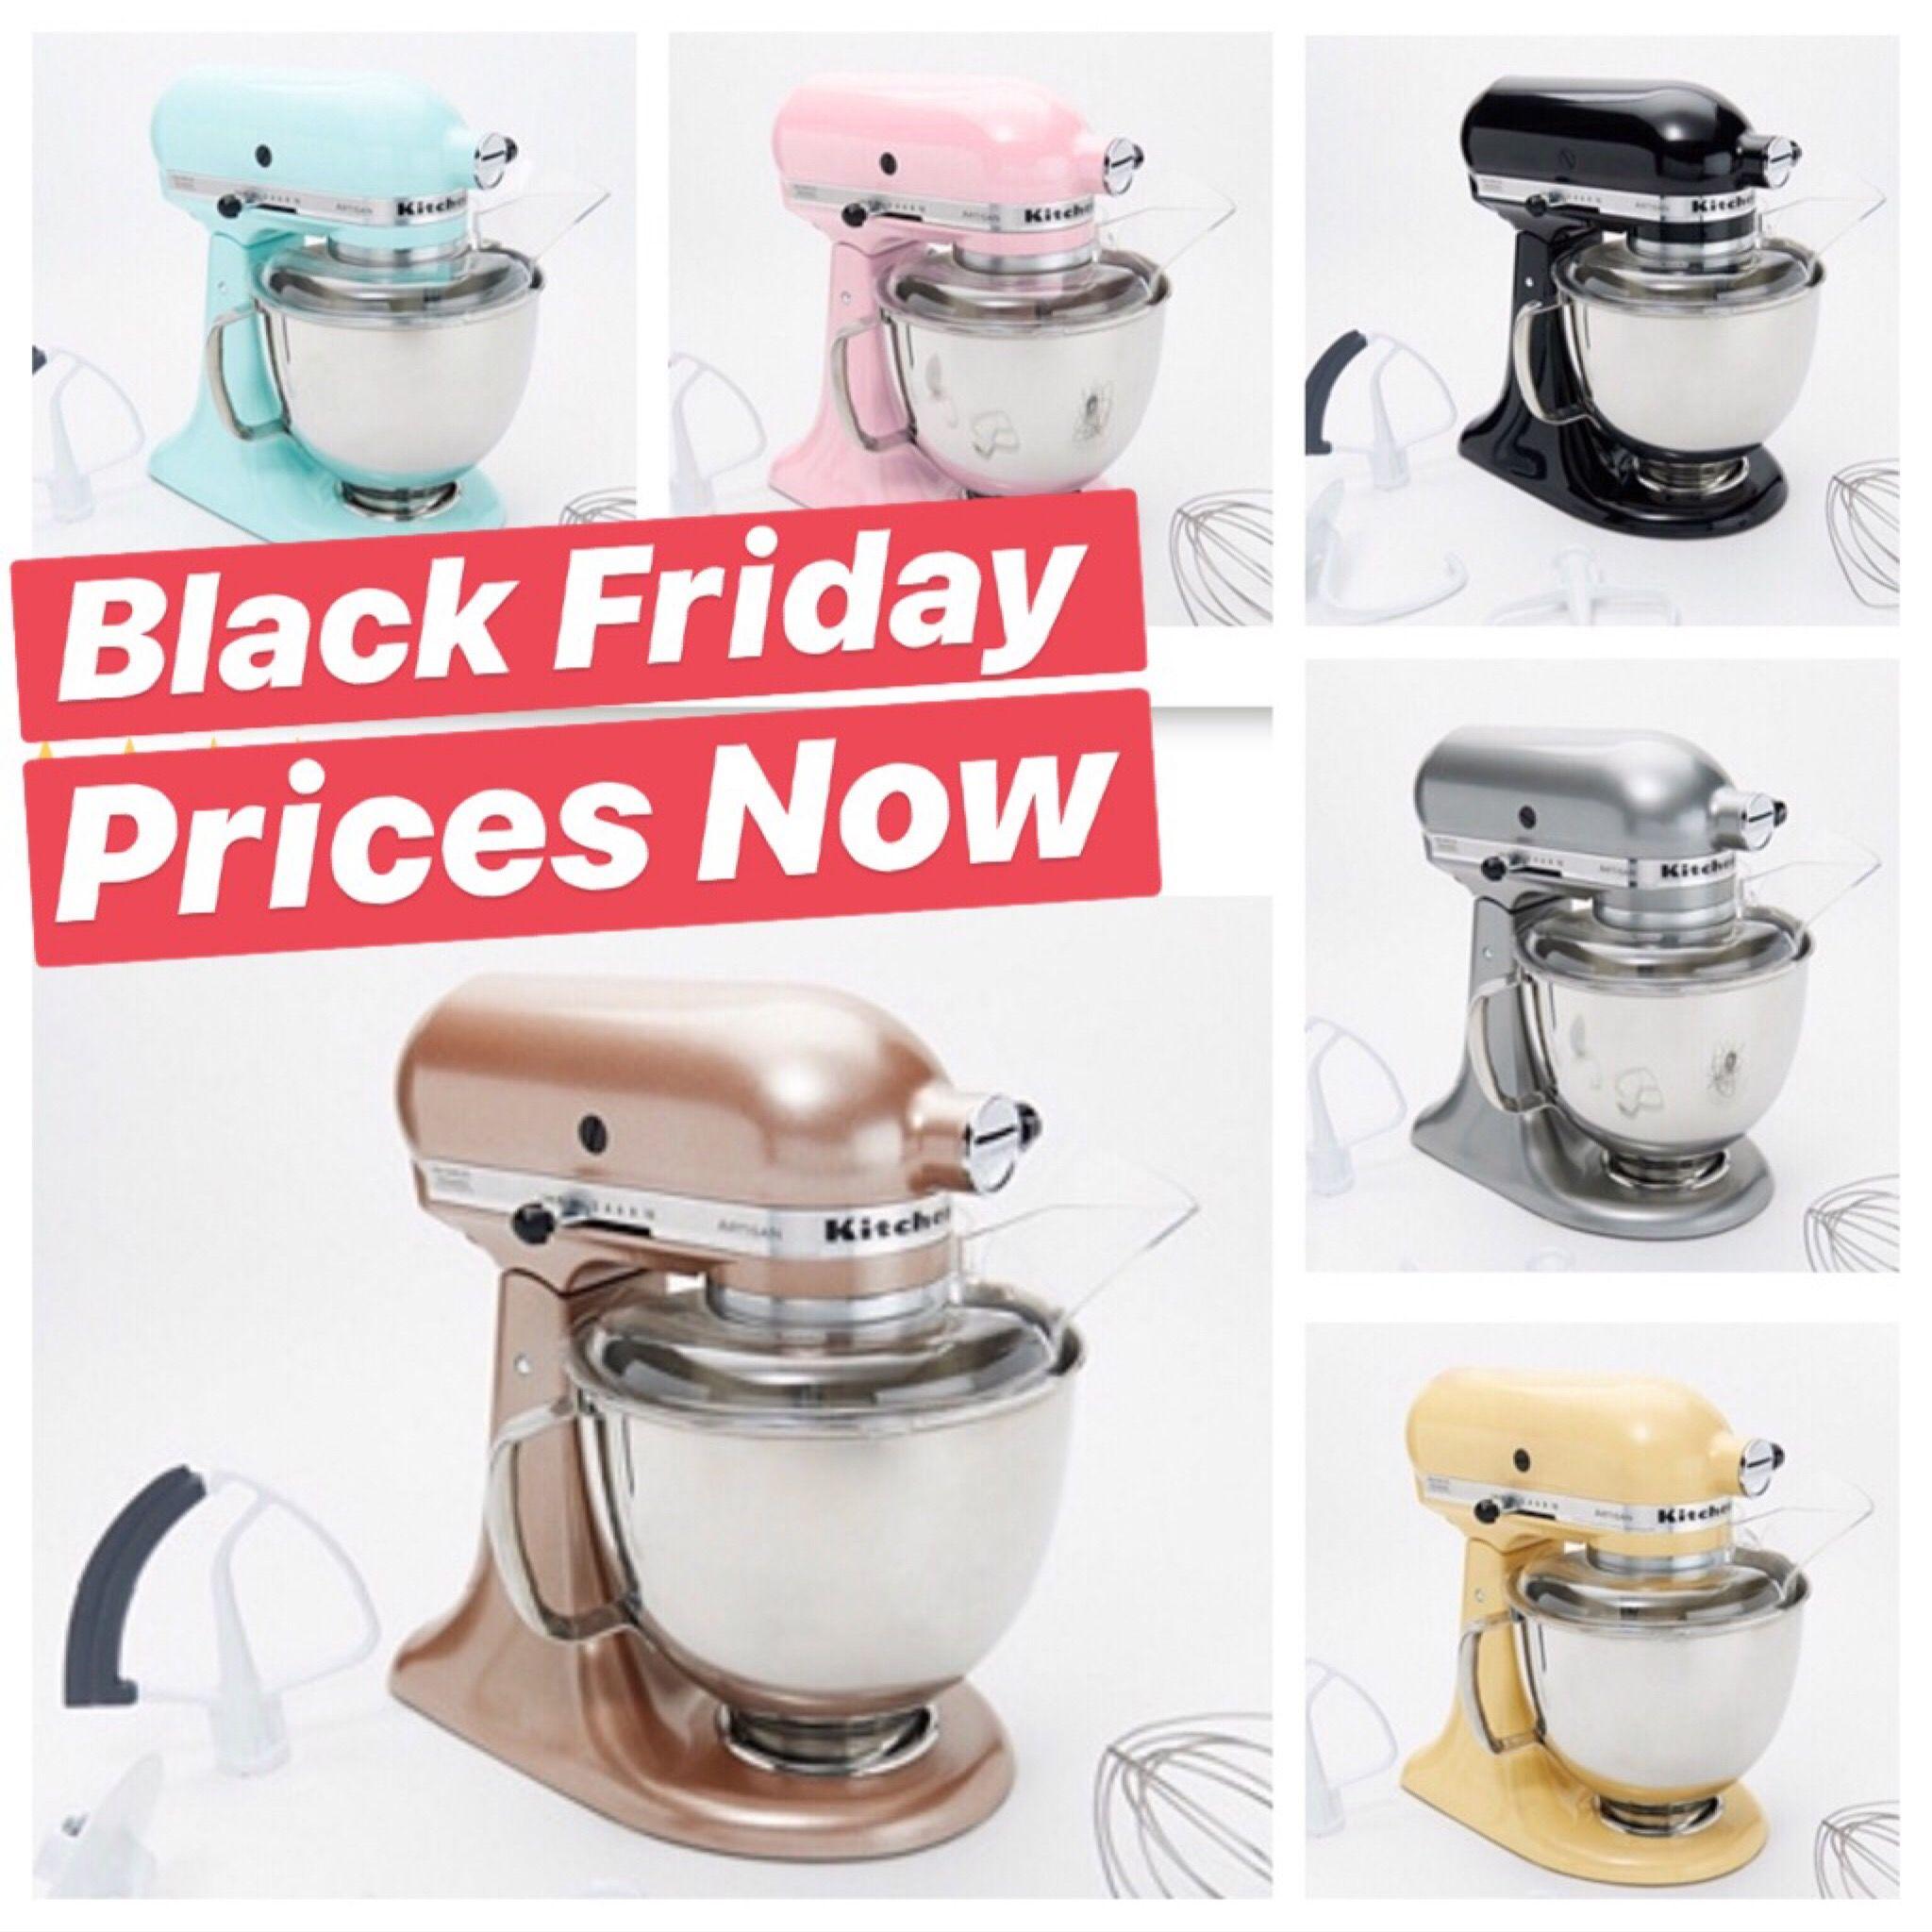 Black friday prices happening now kitchenaid mixer on